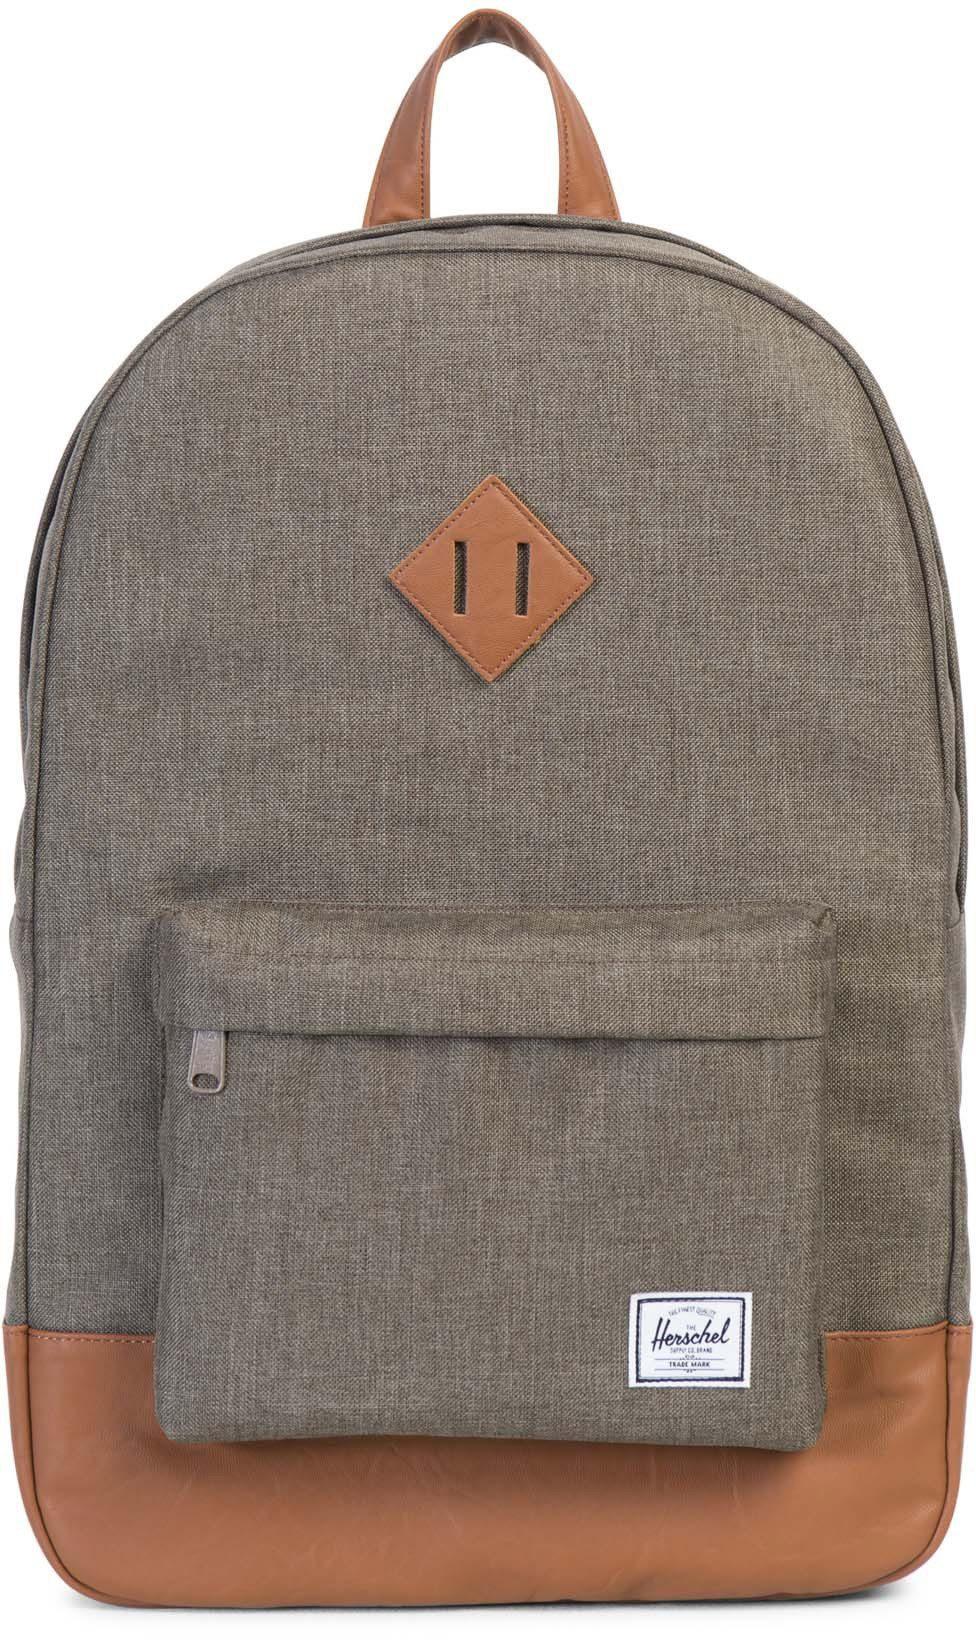 Herschel Rucksack mit Laptopfach, »Heritage Backpack, Canteen Crosshatch«